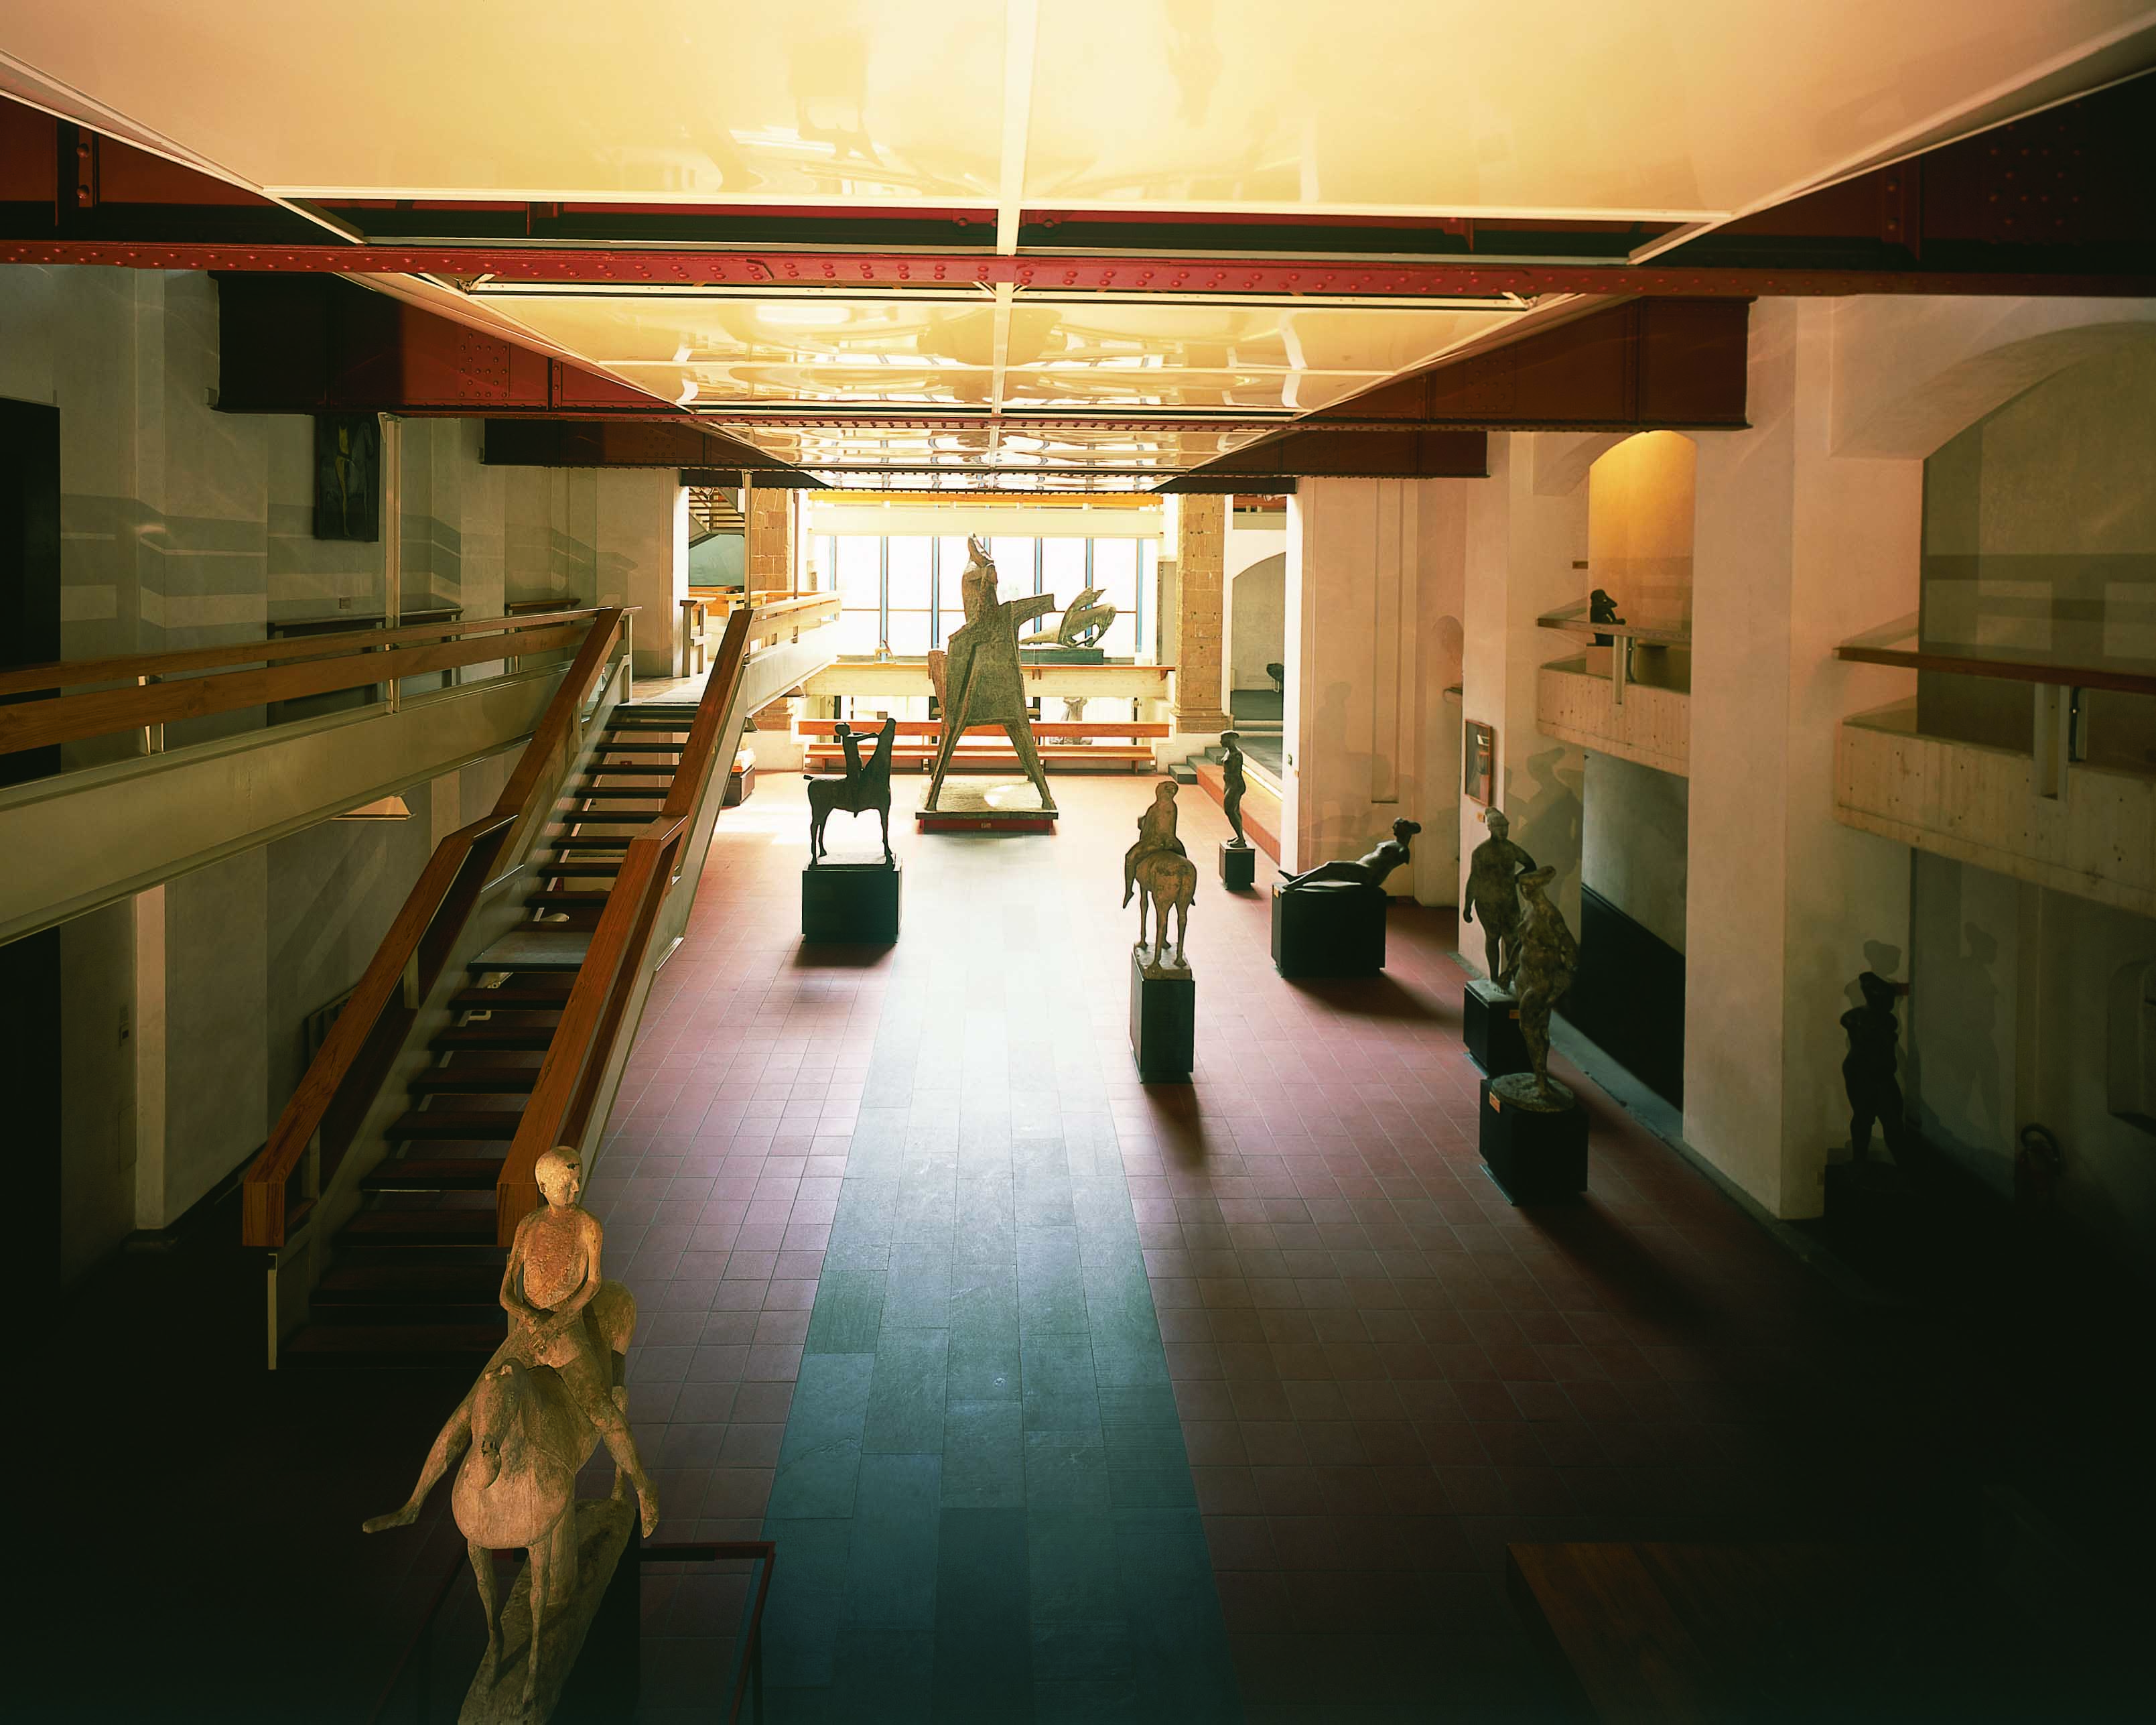 http://illum.it/wp-content/uploads/2019/06/Museo-Marino-Marini-Firenze-.jpg